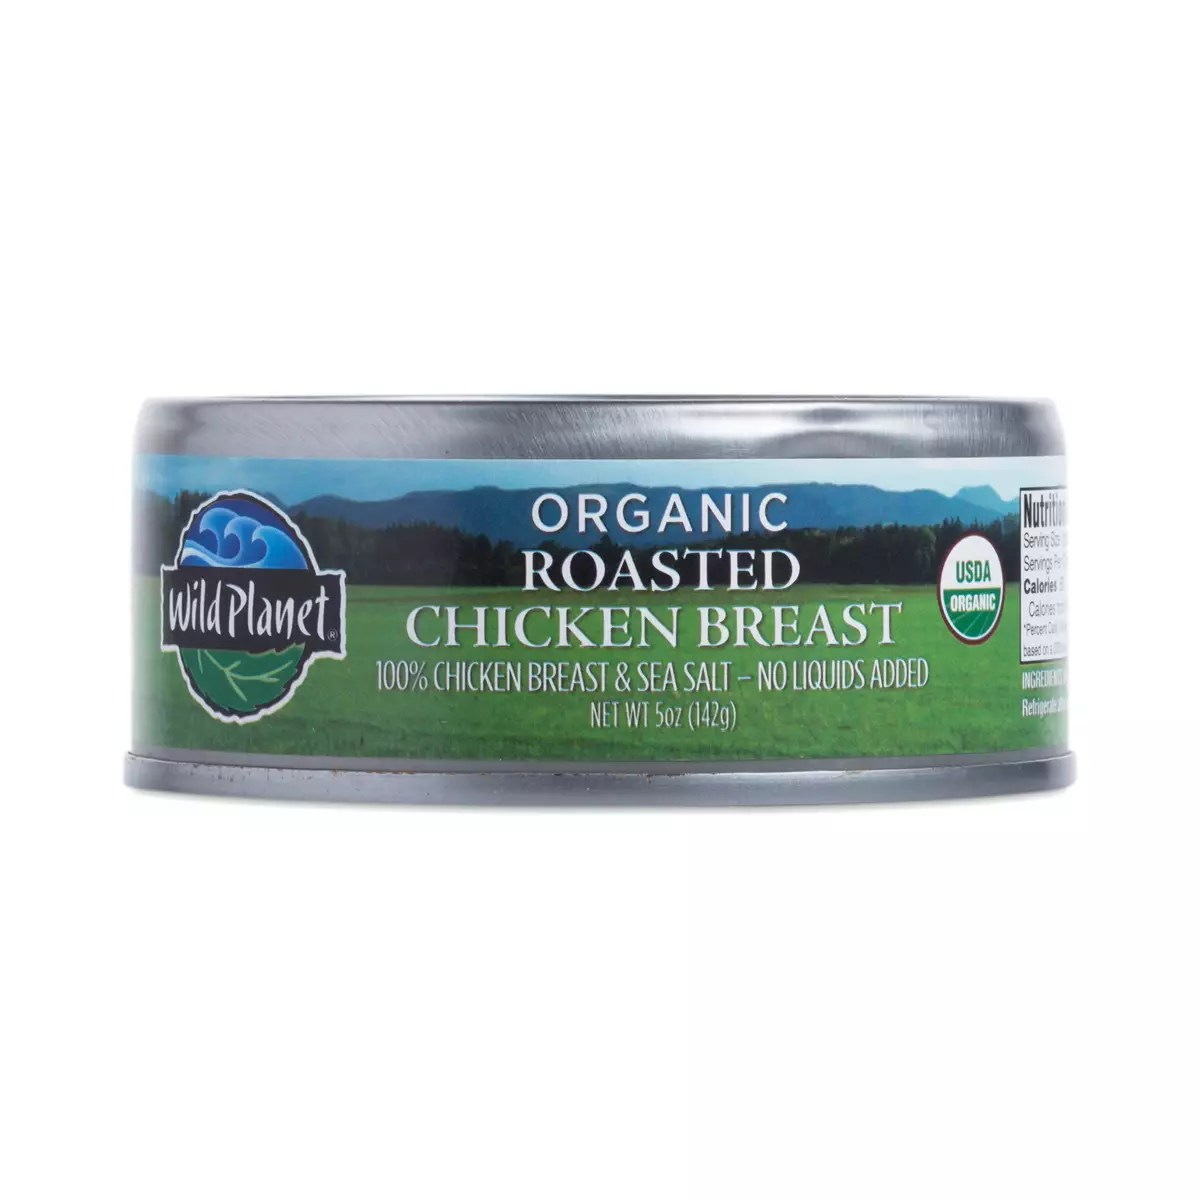 Organic Roasted Chicken Breast